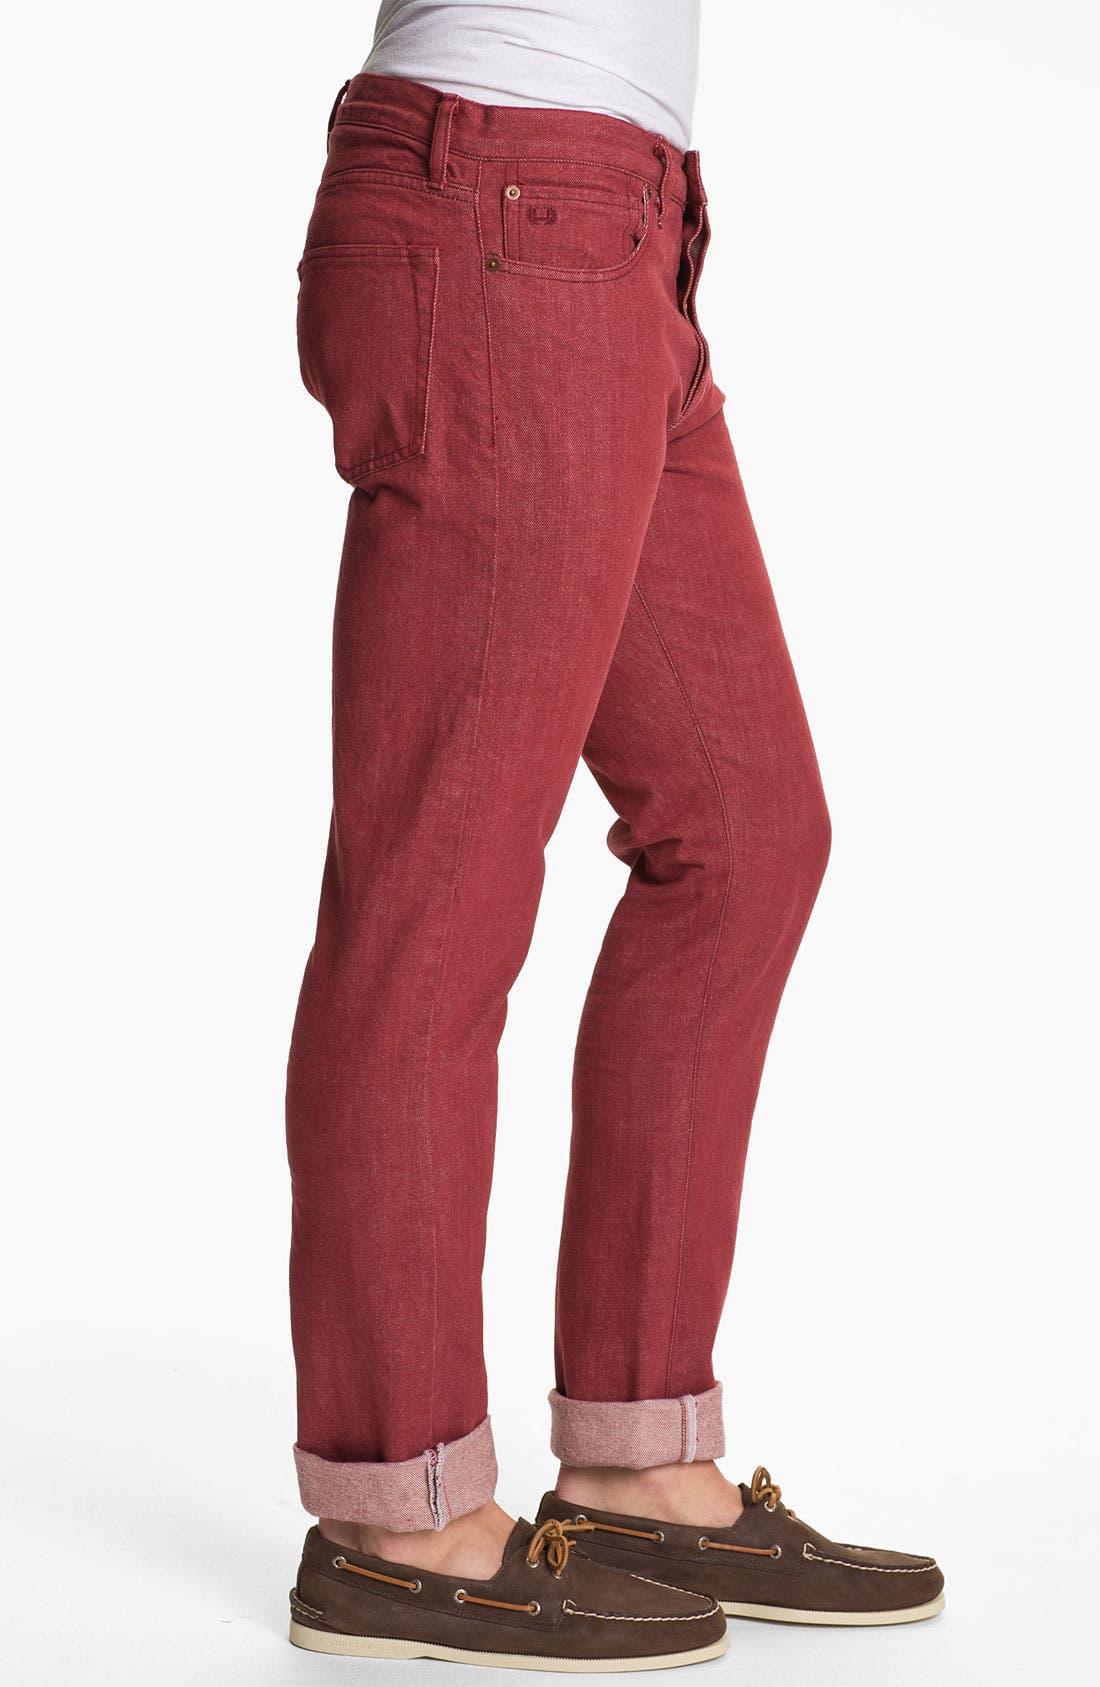 Alternate Image 3  - J. Press York Street 'Hanover' Slim Fit Selvedge Jeans